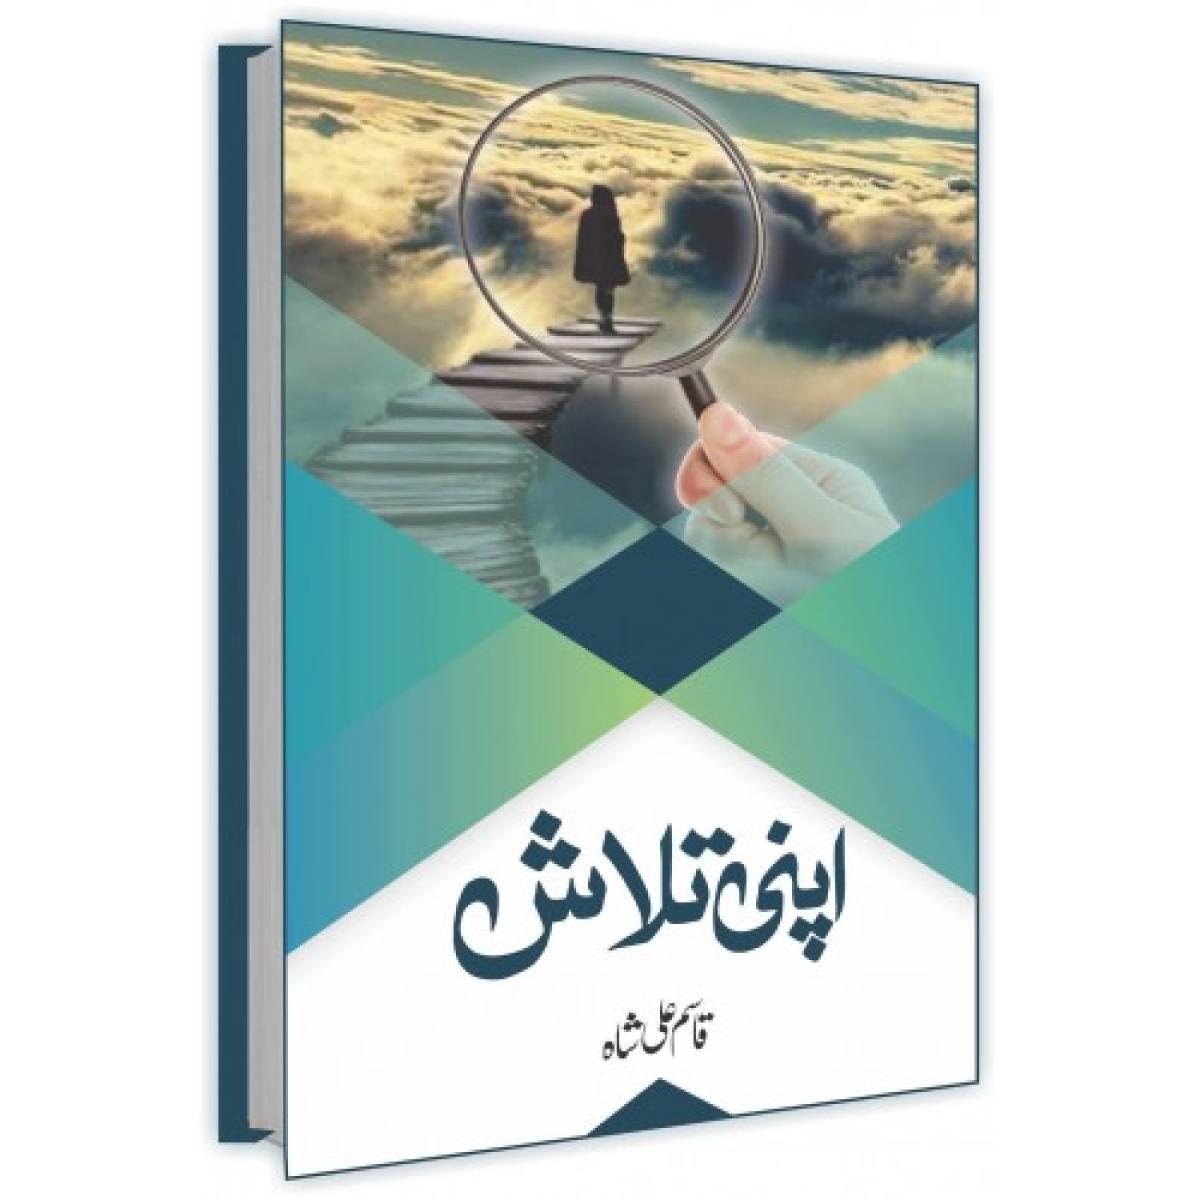 Apni Talash By Qasim Ali Shah Apni Talaash Novel by Qasim Ali Shah Best selling urdu reading book